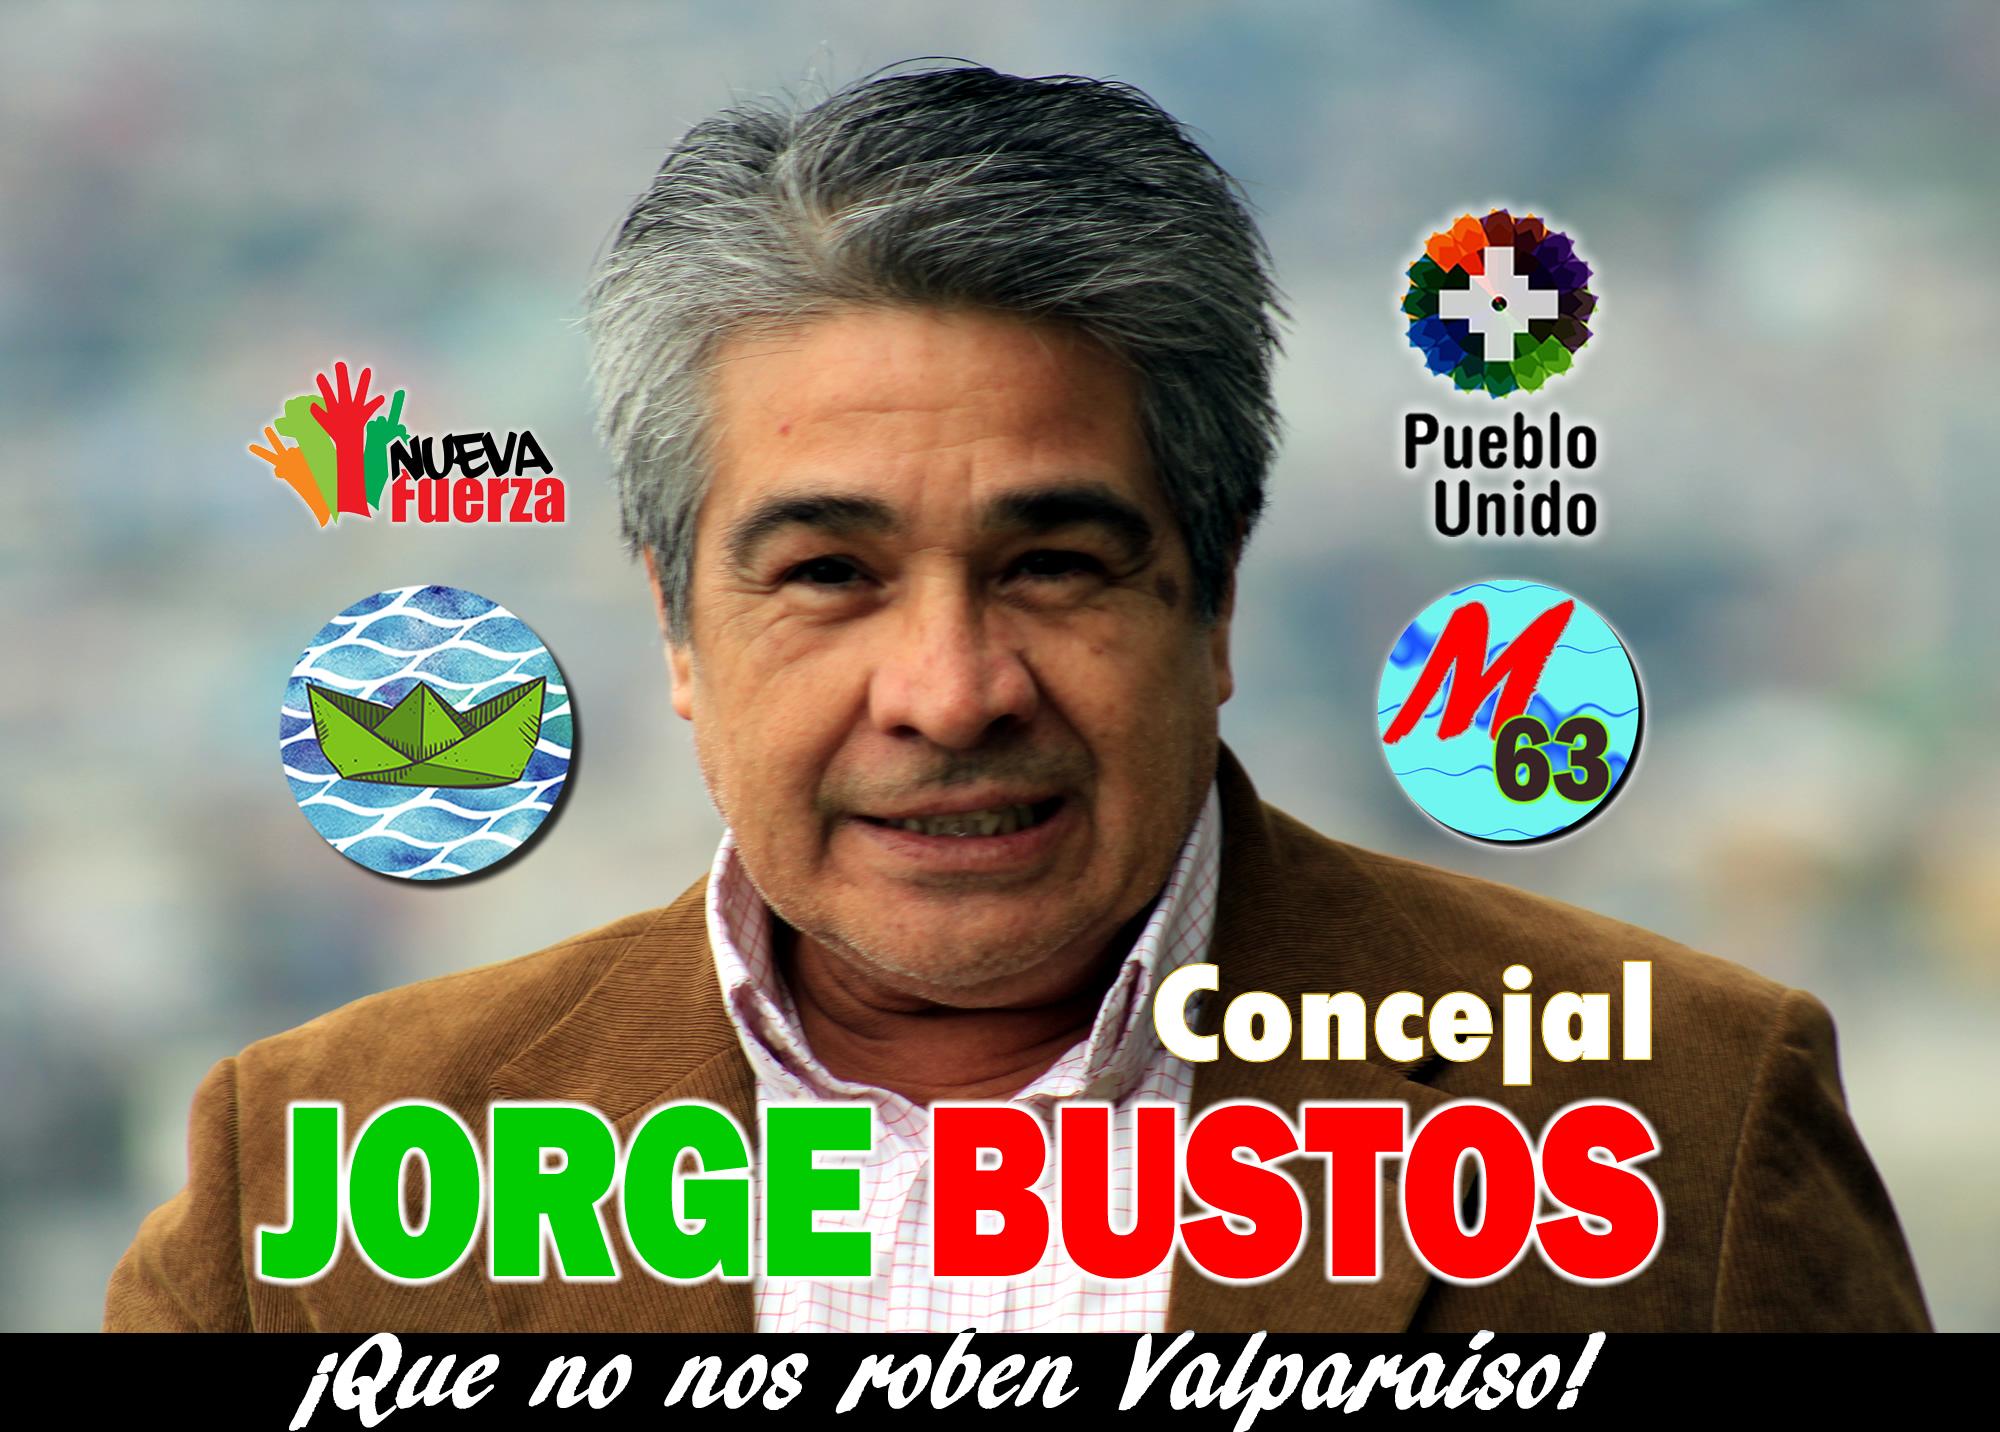 Jorge Bustos, Concejal